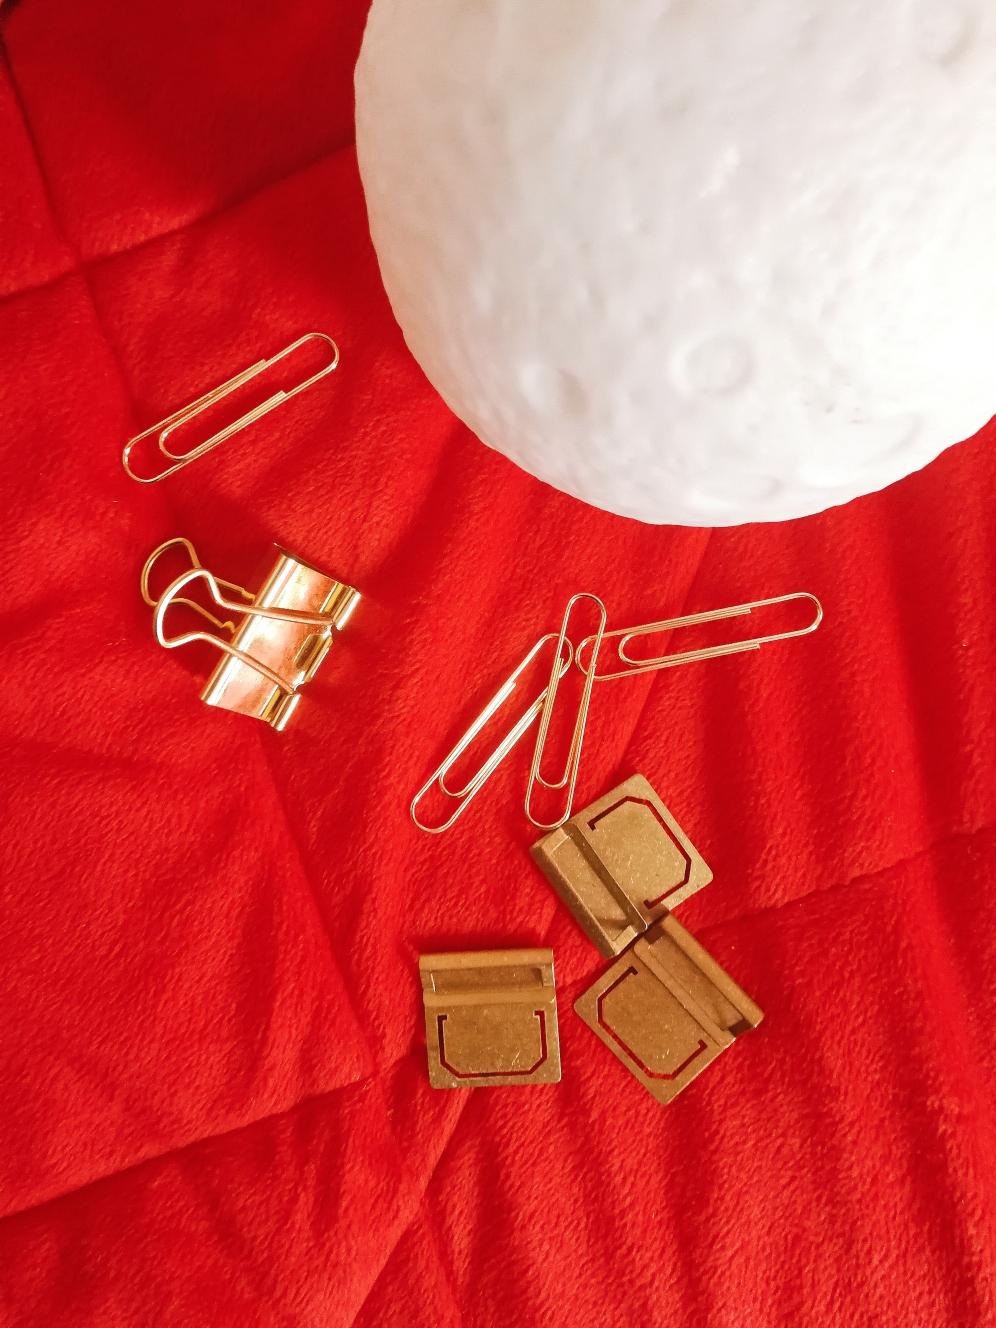 Etsy Planner Haul Brass Tabs CrossbowPrintables